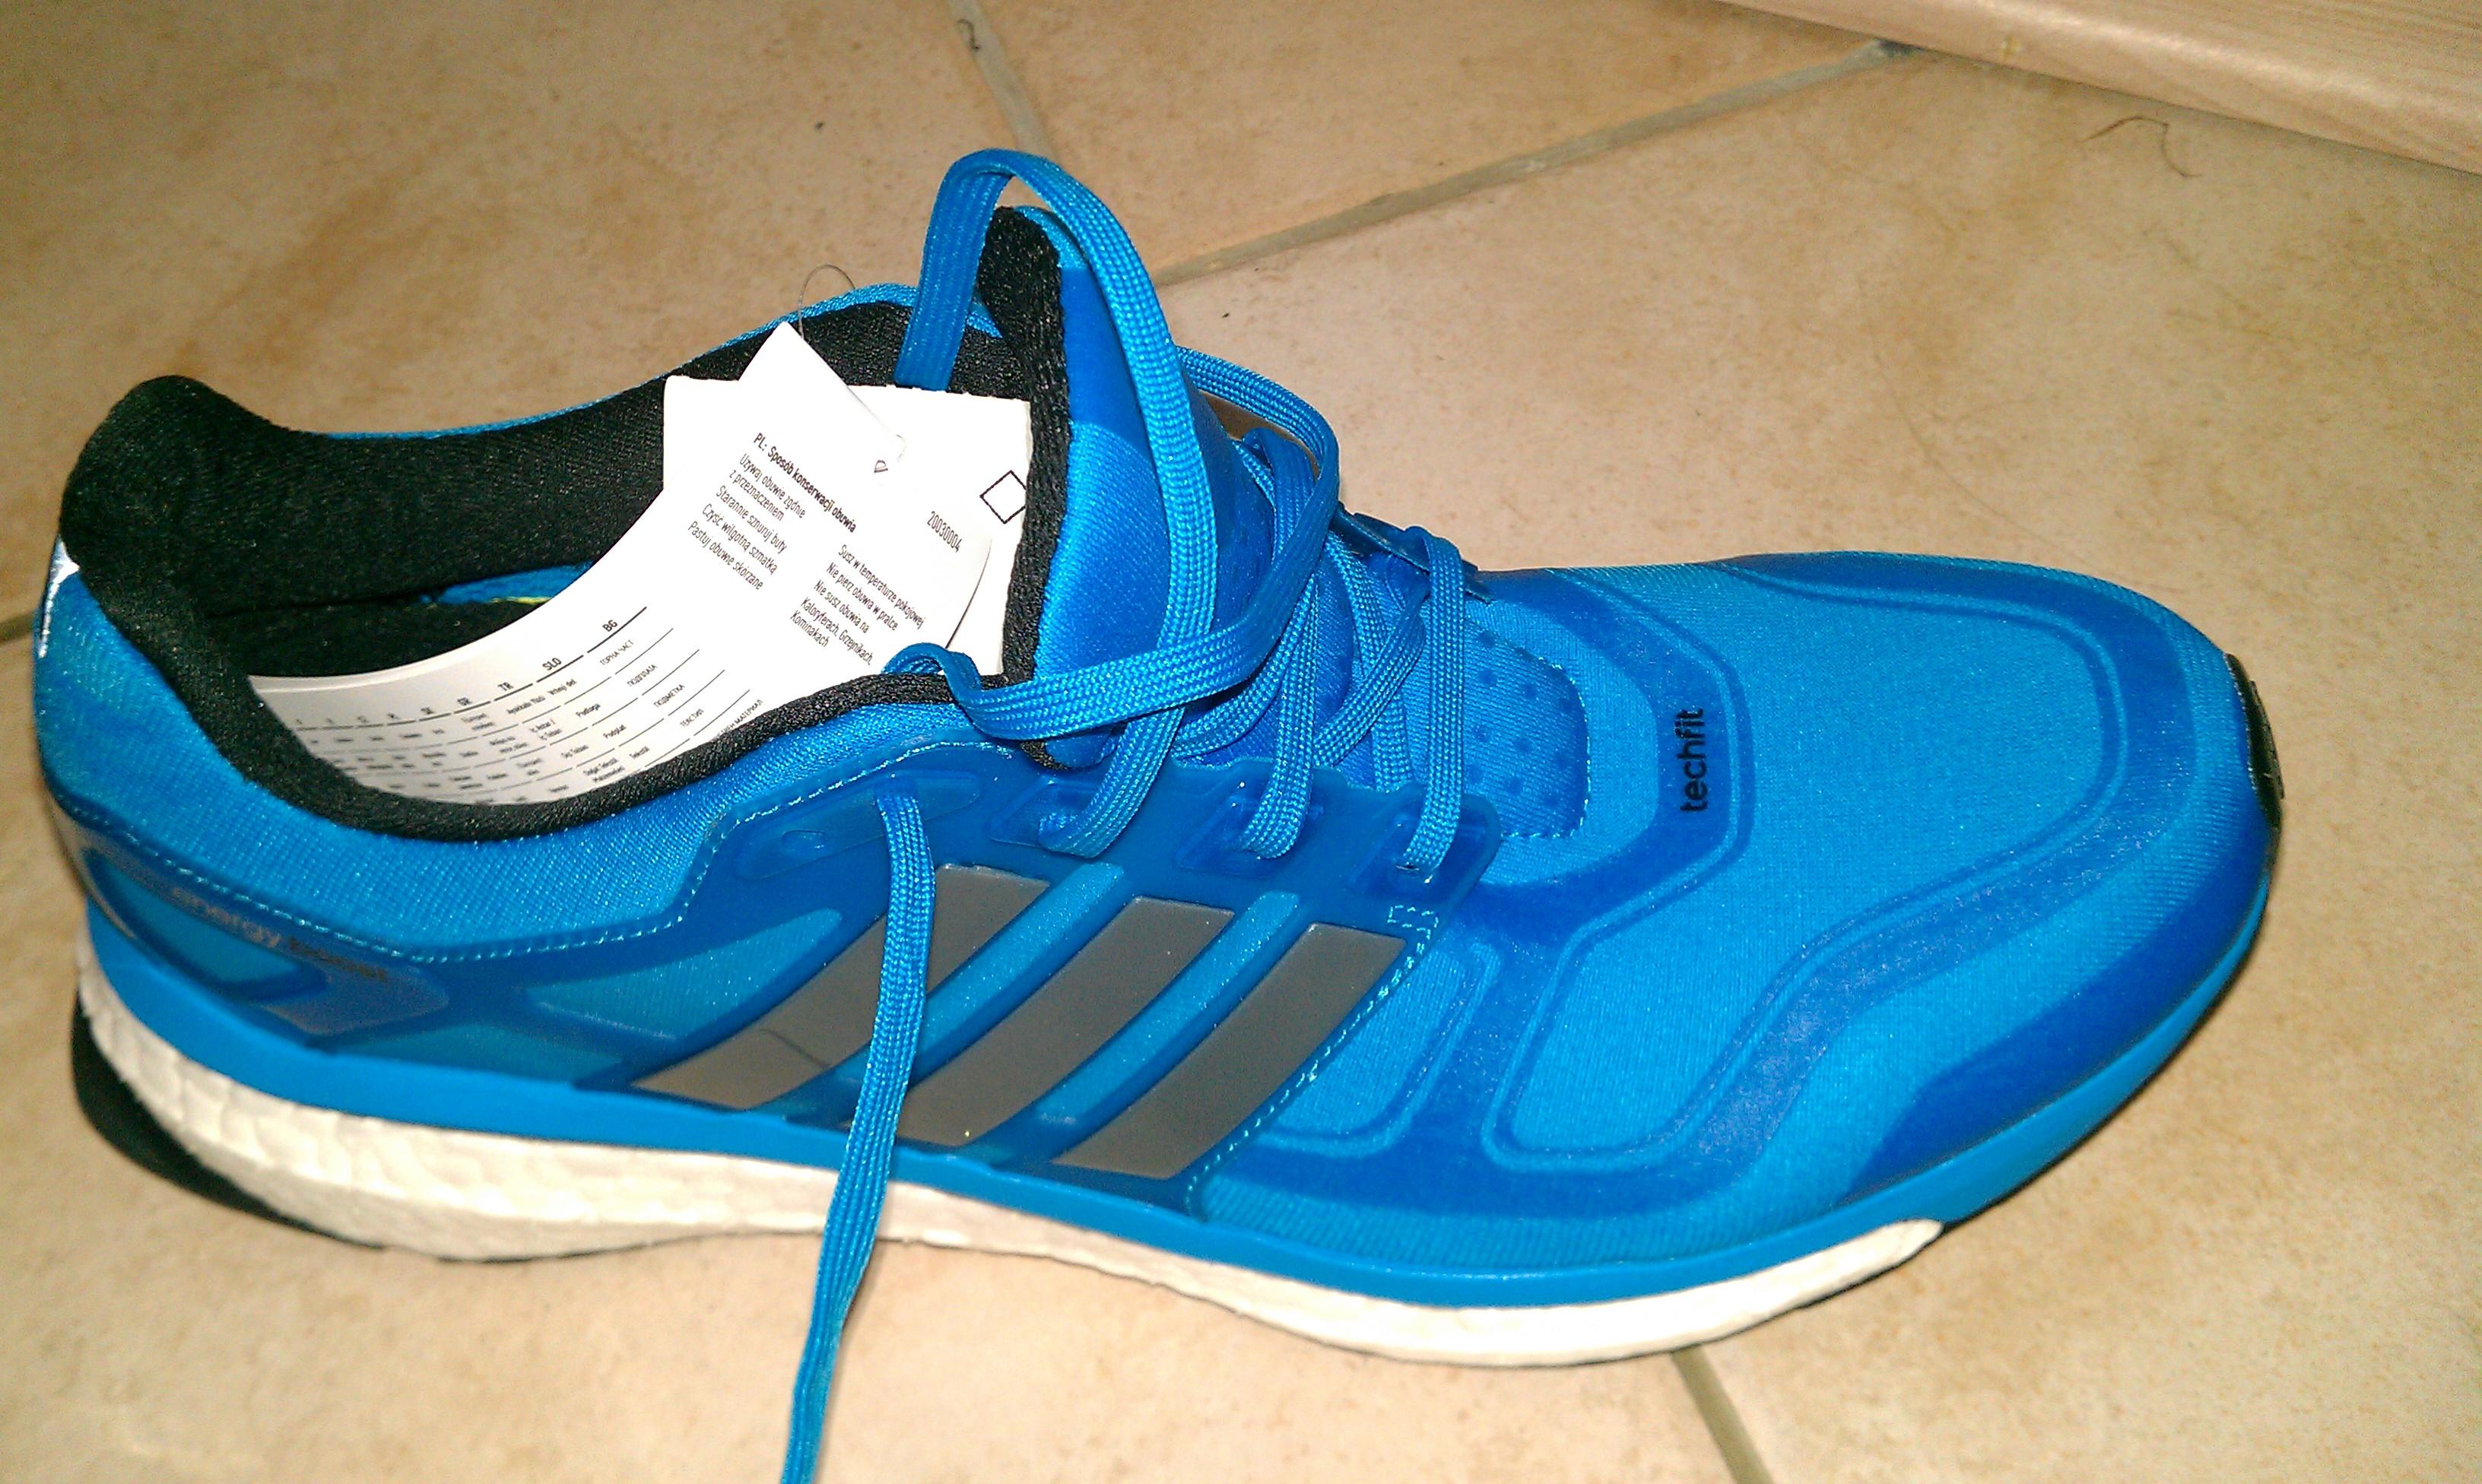 b7b1456f41d Recenze běžeckých bot Adidas Energy Boost 2